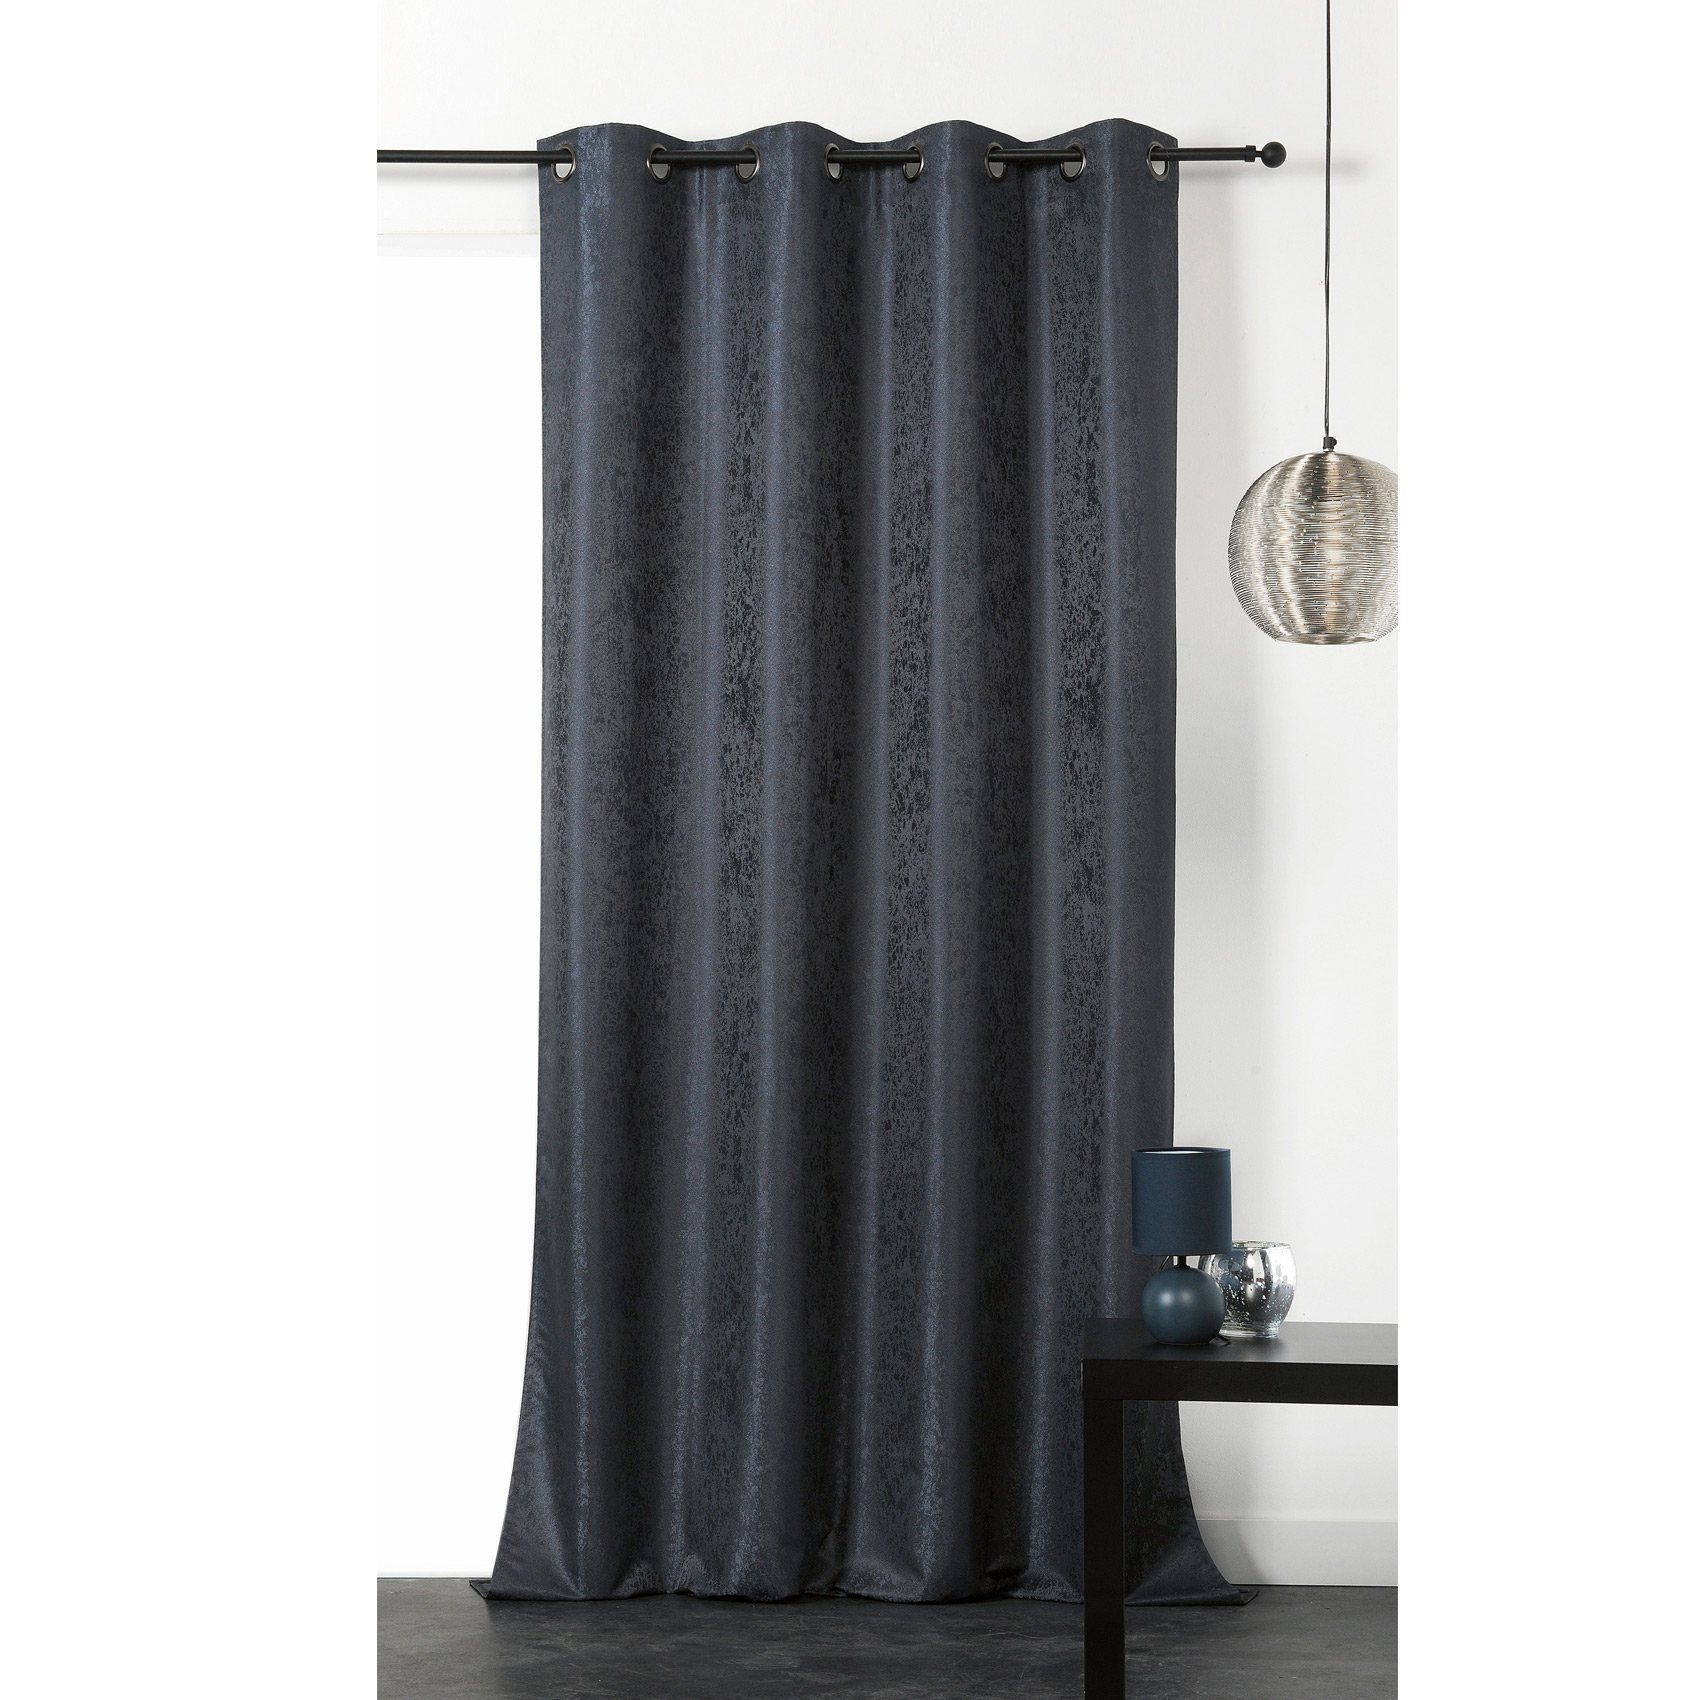 Rideau occultant nova polyester gris anthracite 240x140